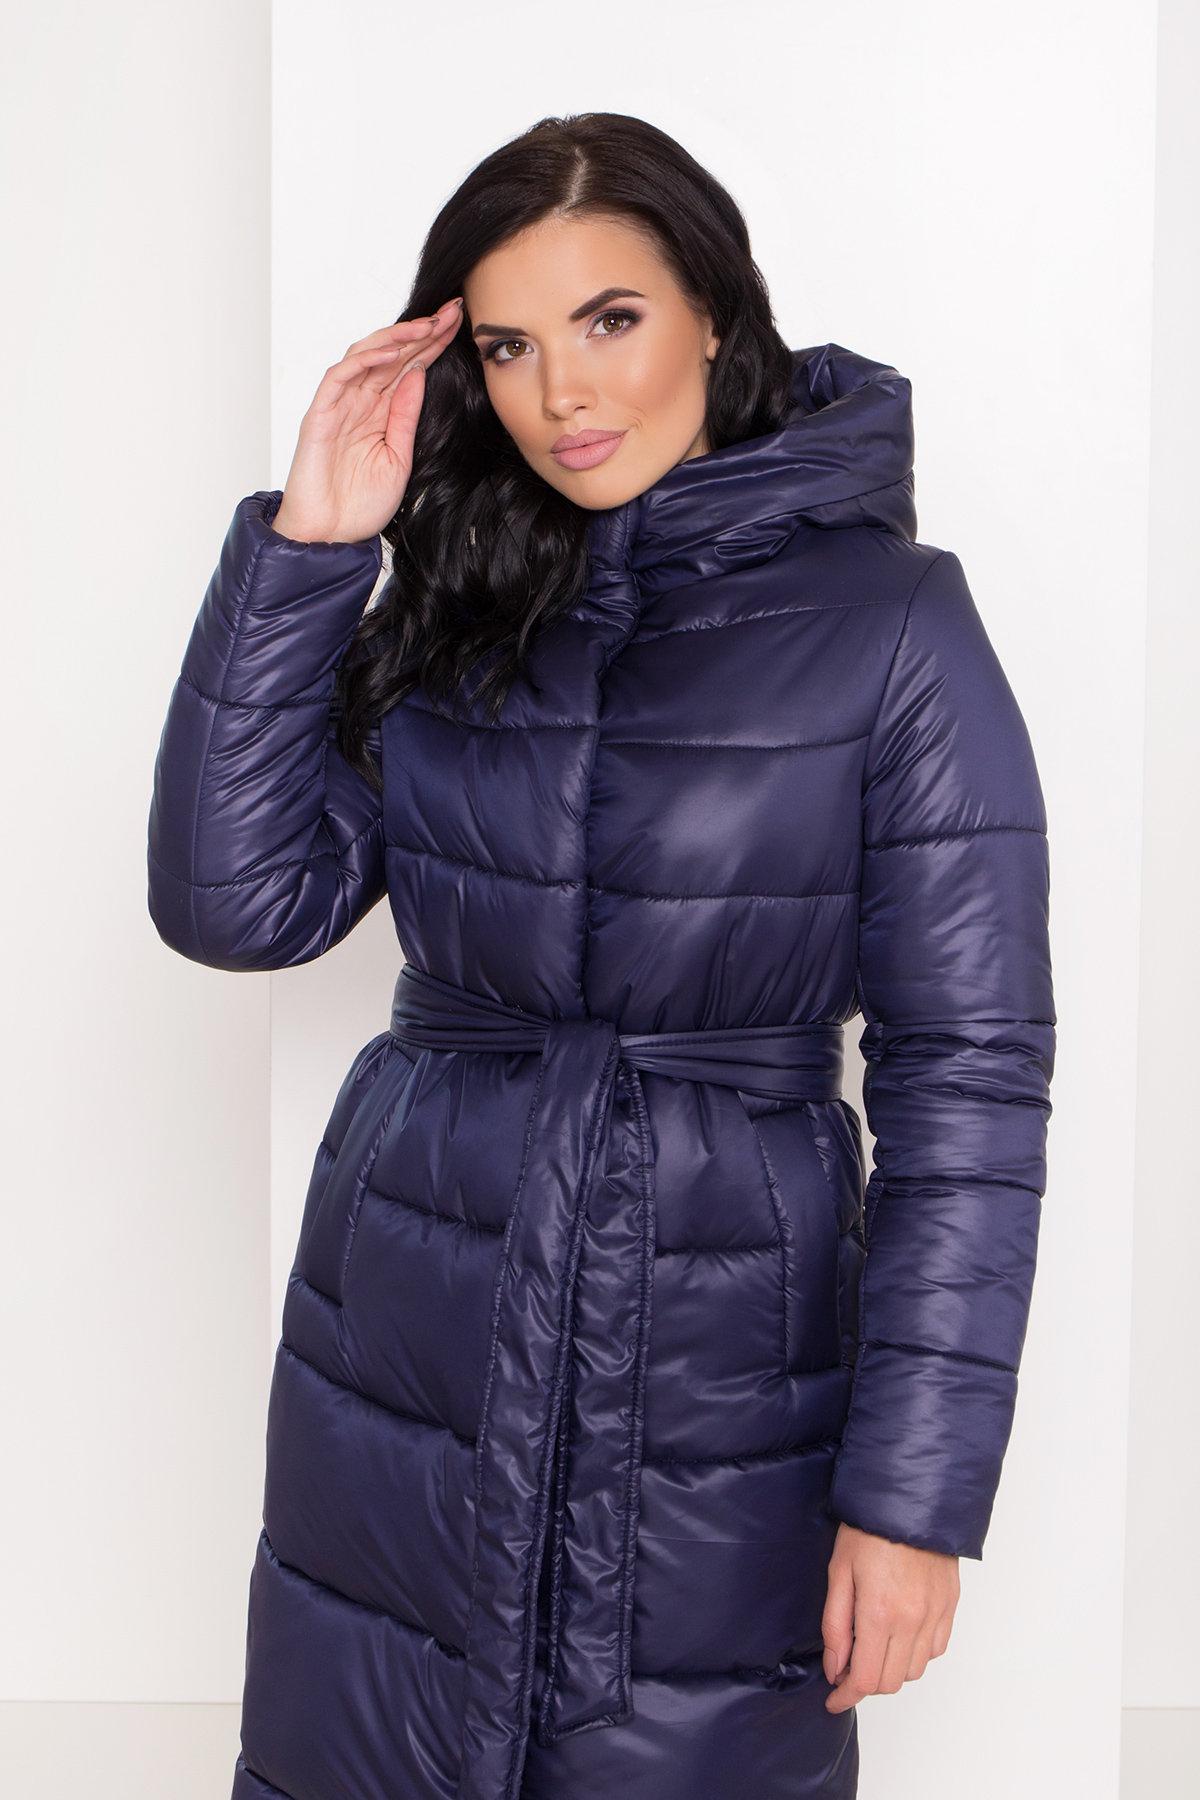 Длинная зимняя куртка-пуховик Сигма 8040 АРТ. 43989 Цвет: Т.синий - фото 4, интернет магазин tm-modus.ru